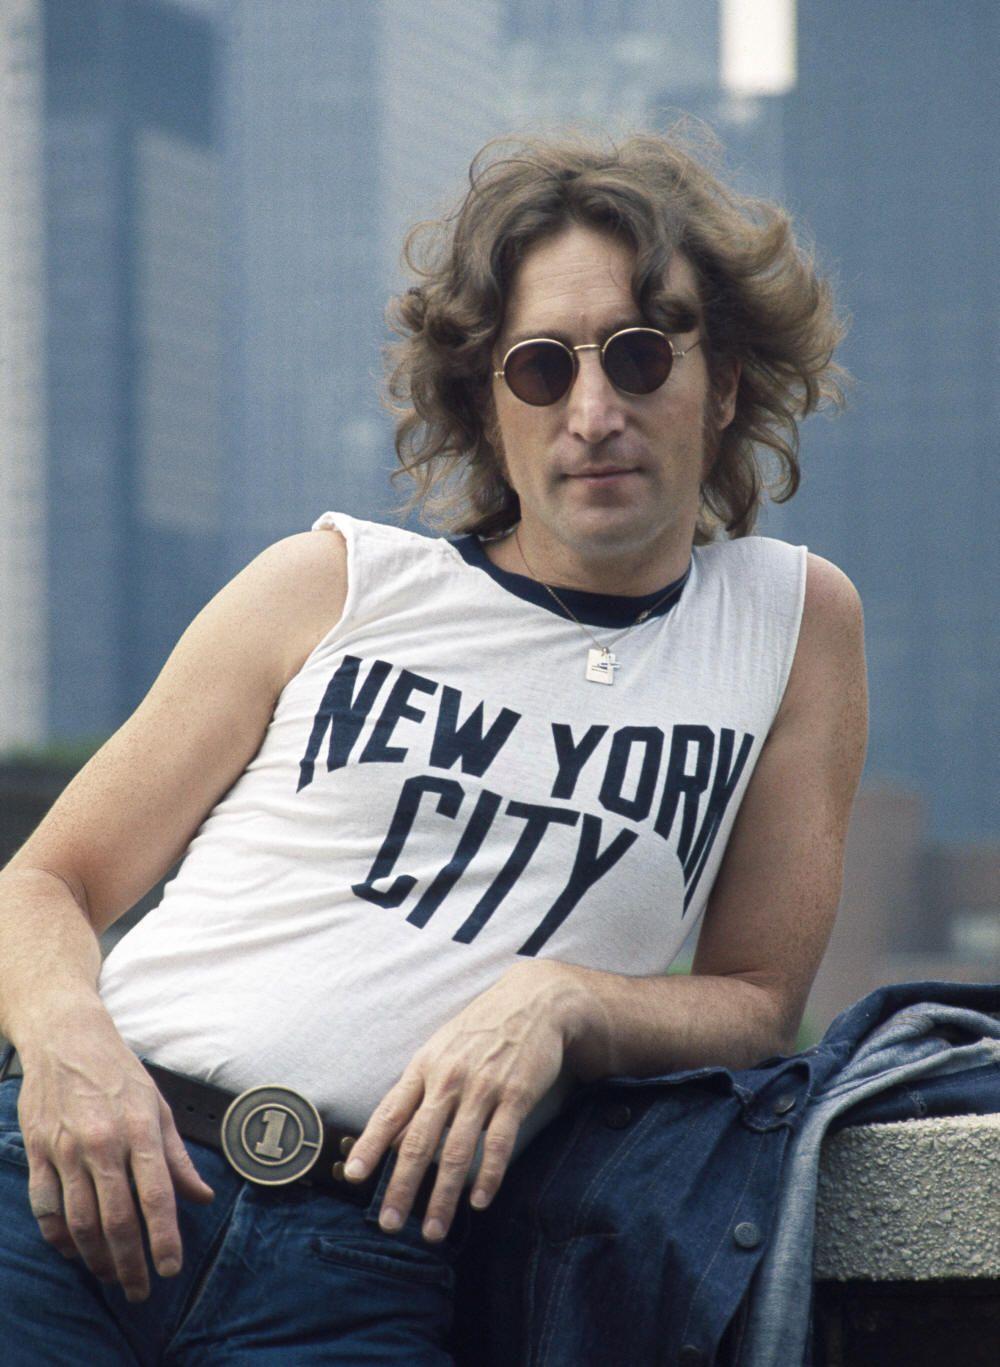 John Lennon s Famous New York City Shirt Shot  How an Iconic Portrait Began  With a Photographer s T-shirt 500241d8379